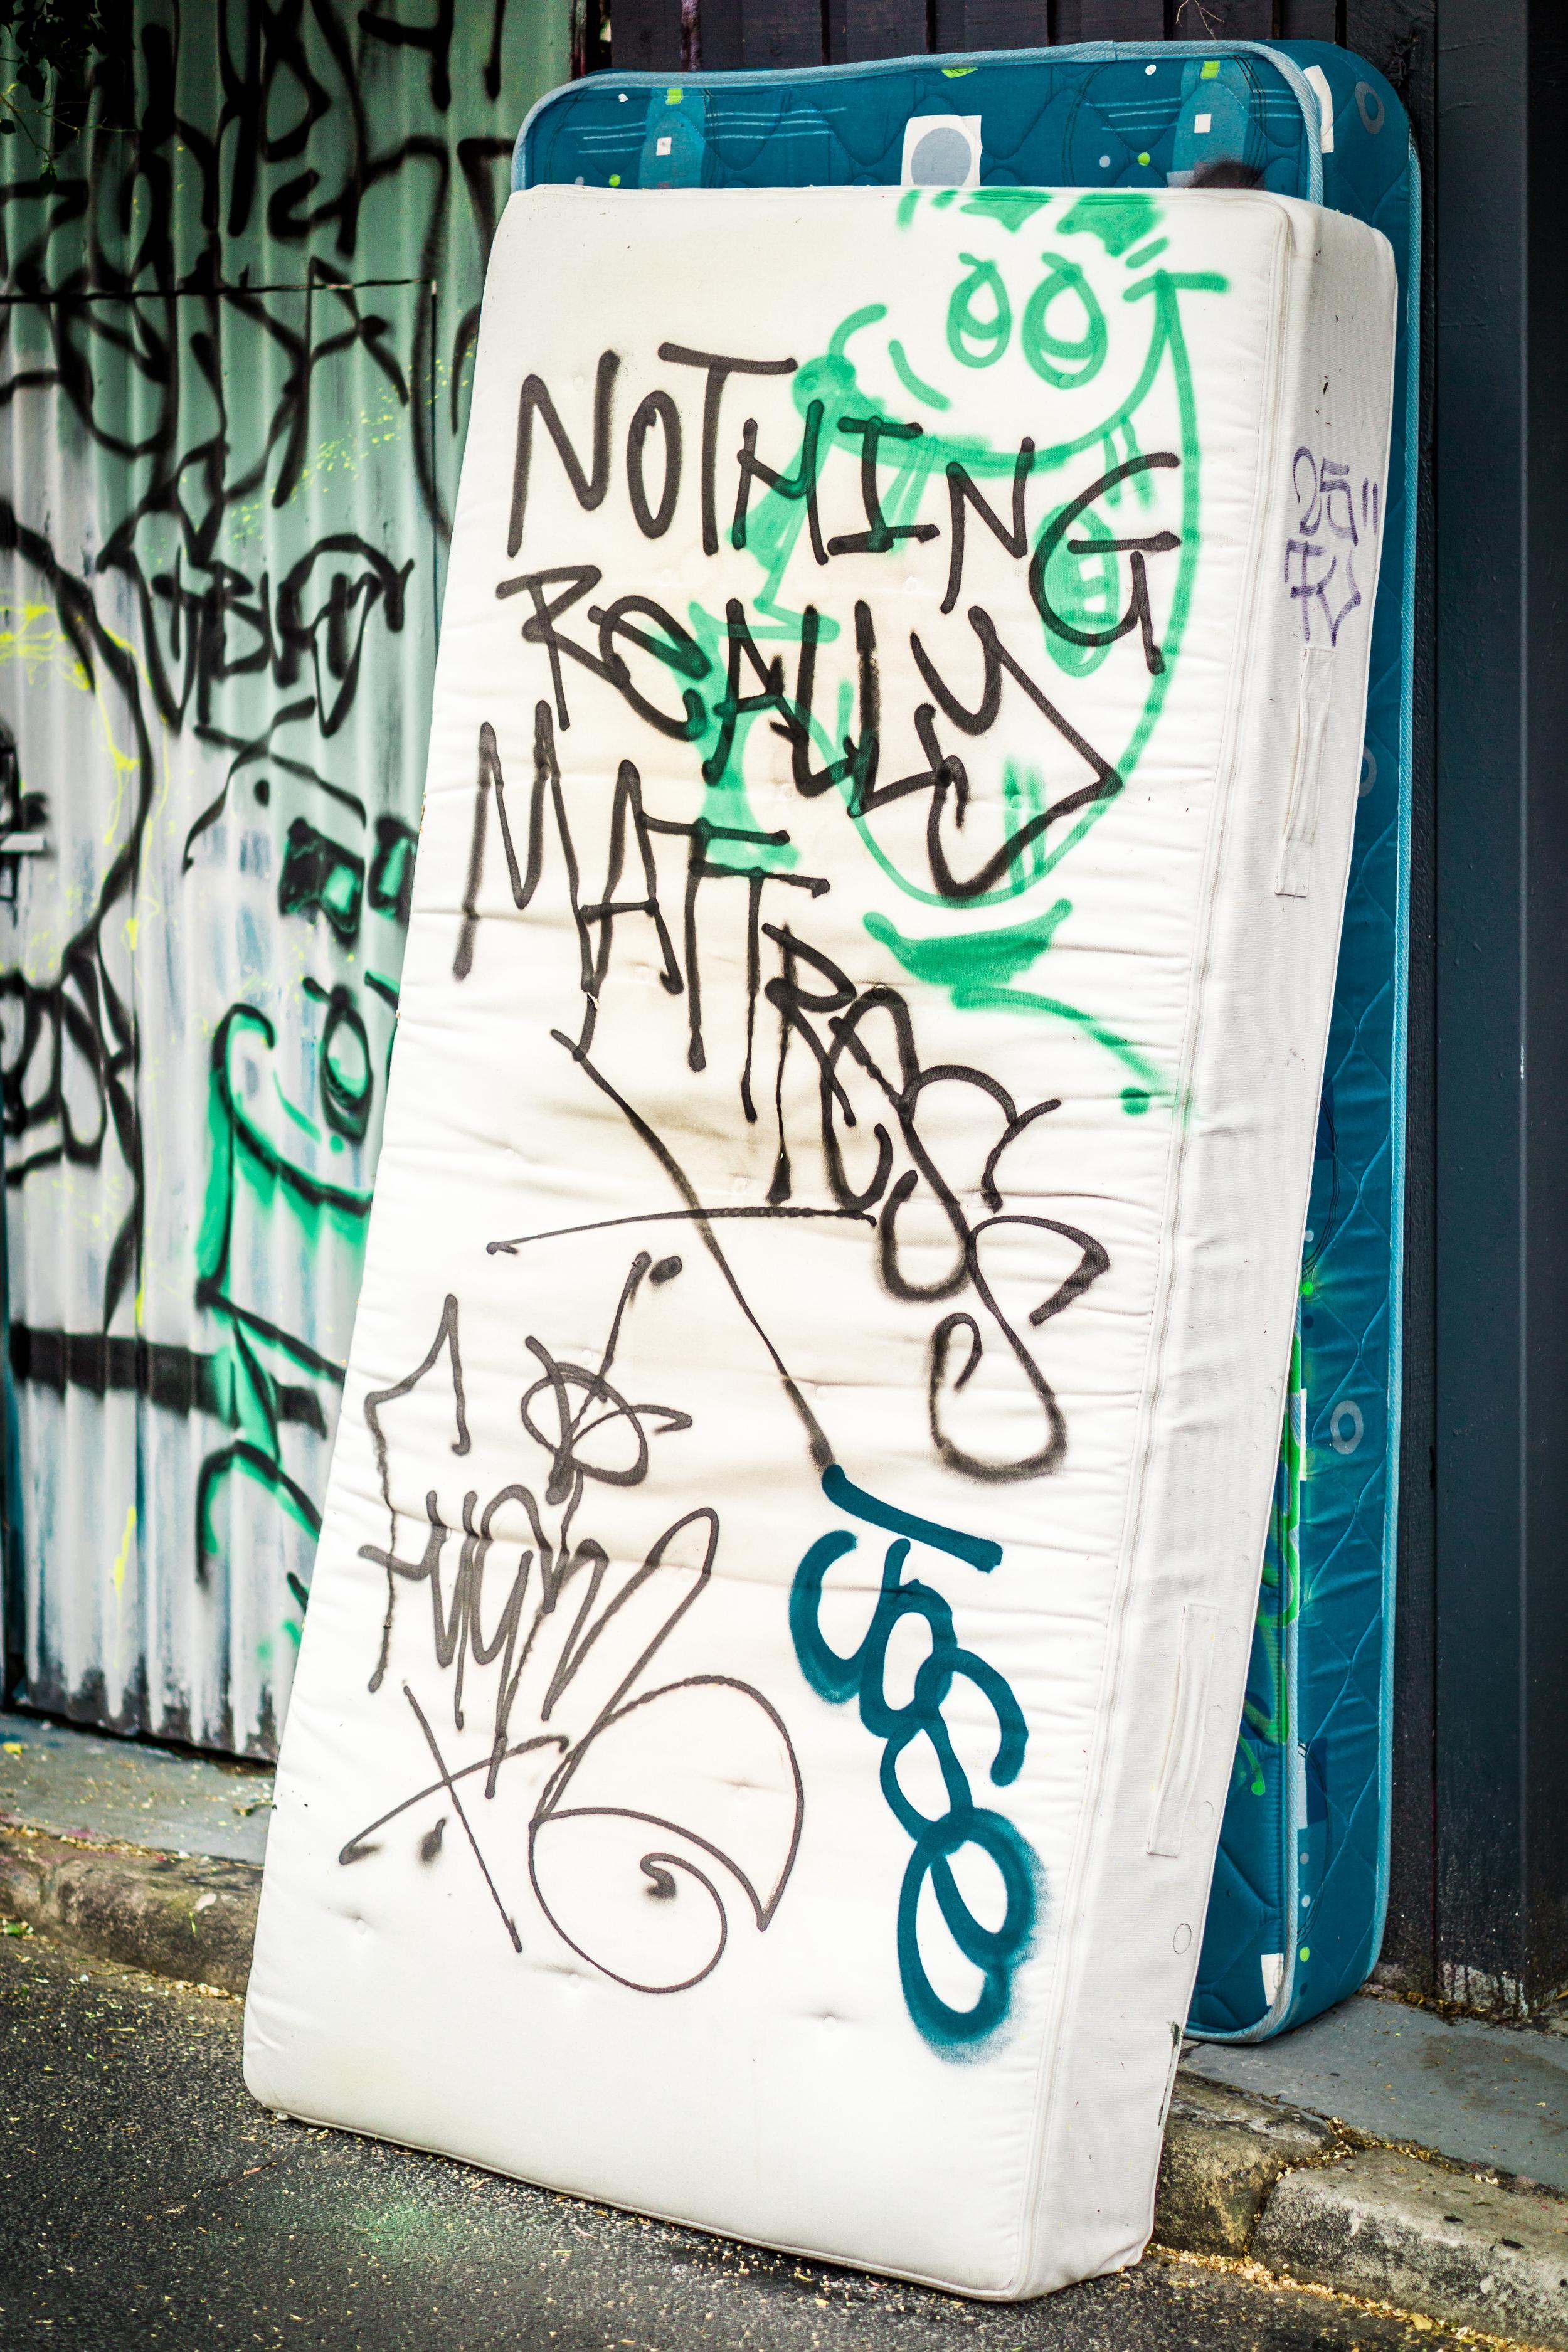 Sydney - St Peters - Street Art - Nothing Really Mattress.jpg